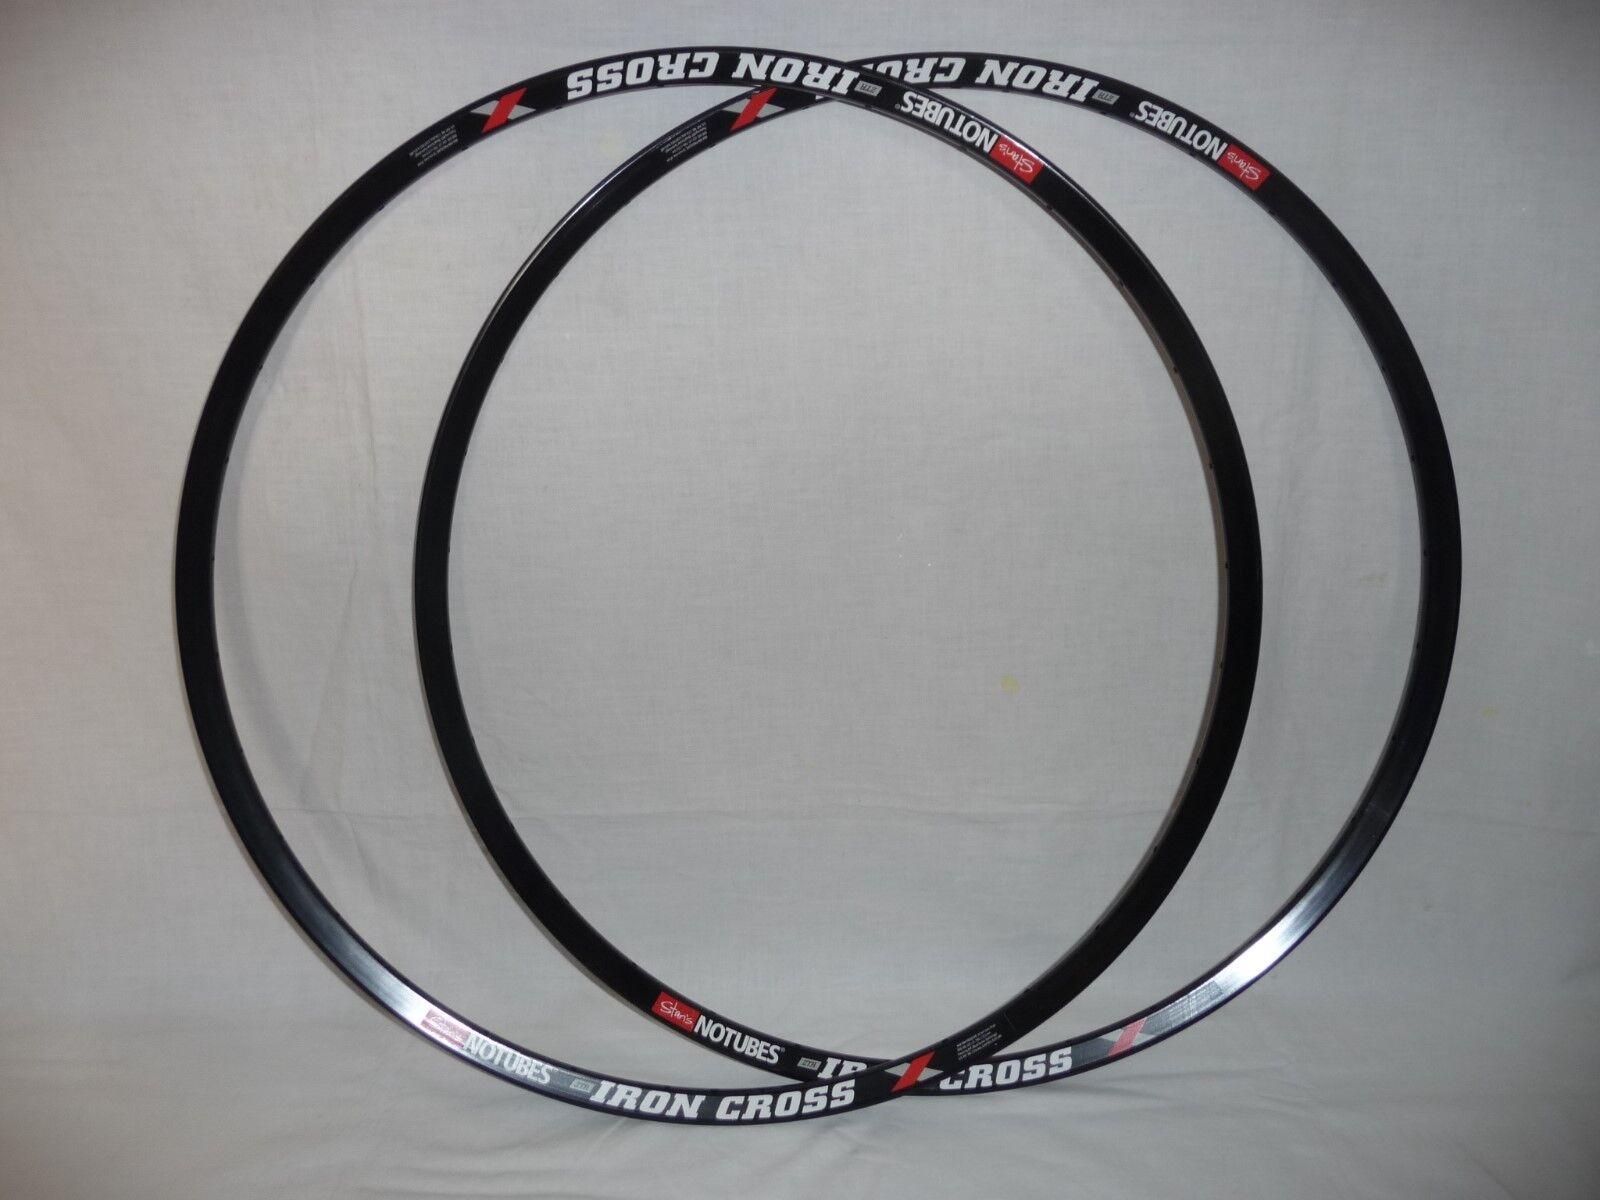 Stans Iron Cross light alloy rims for cyclocross gravel bike x 2